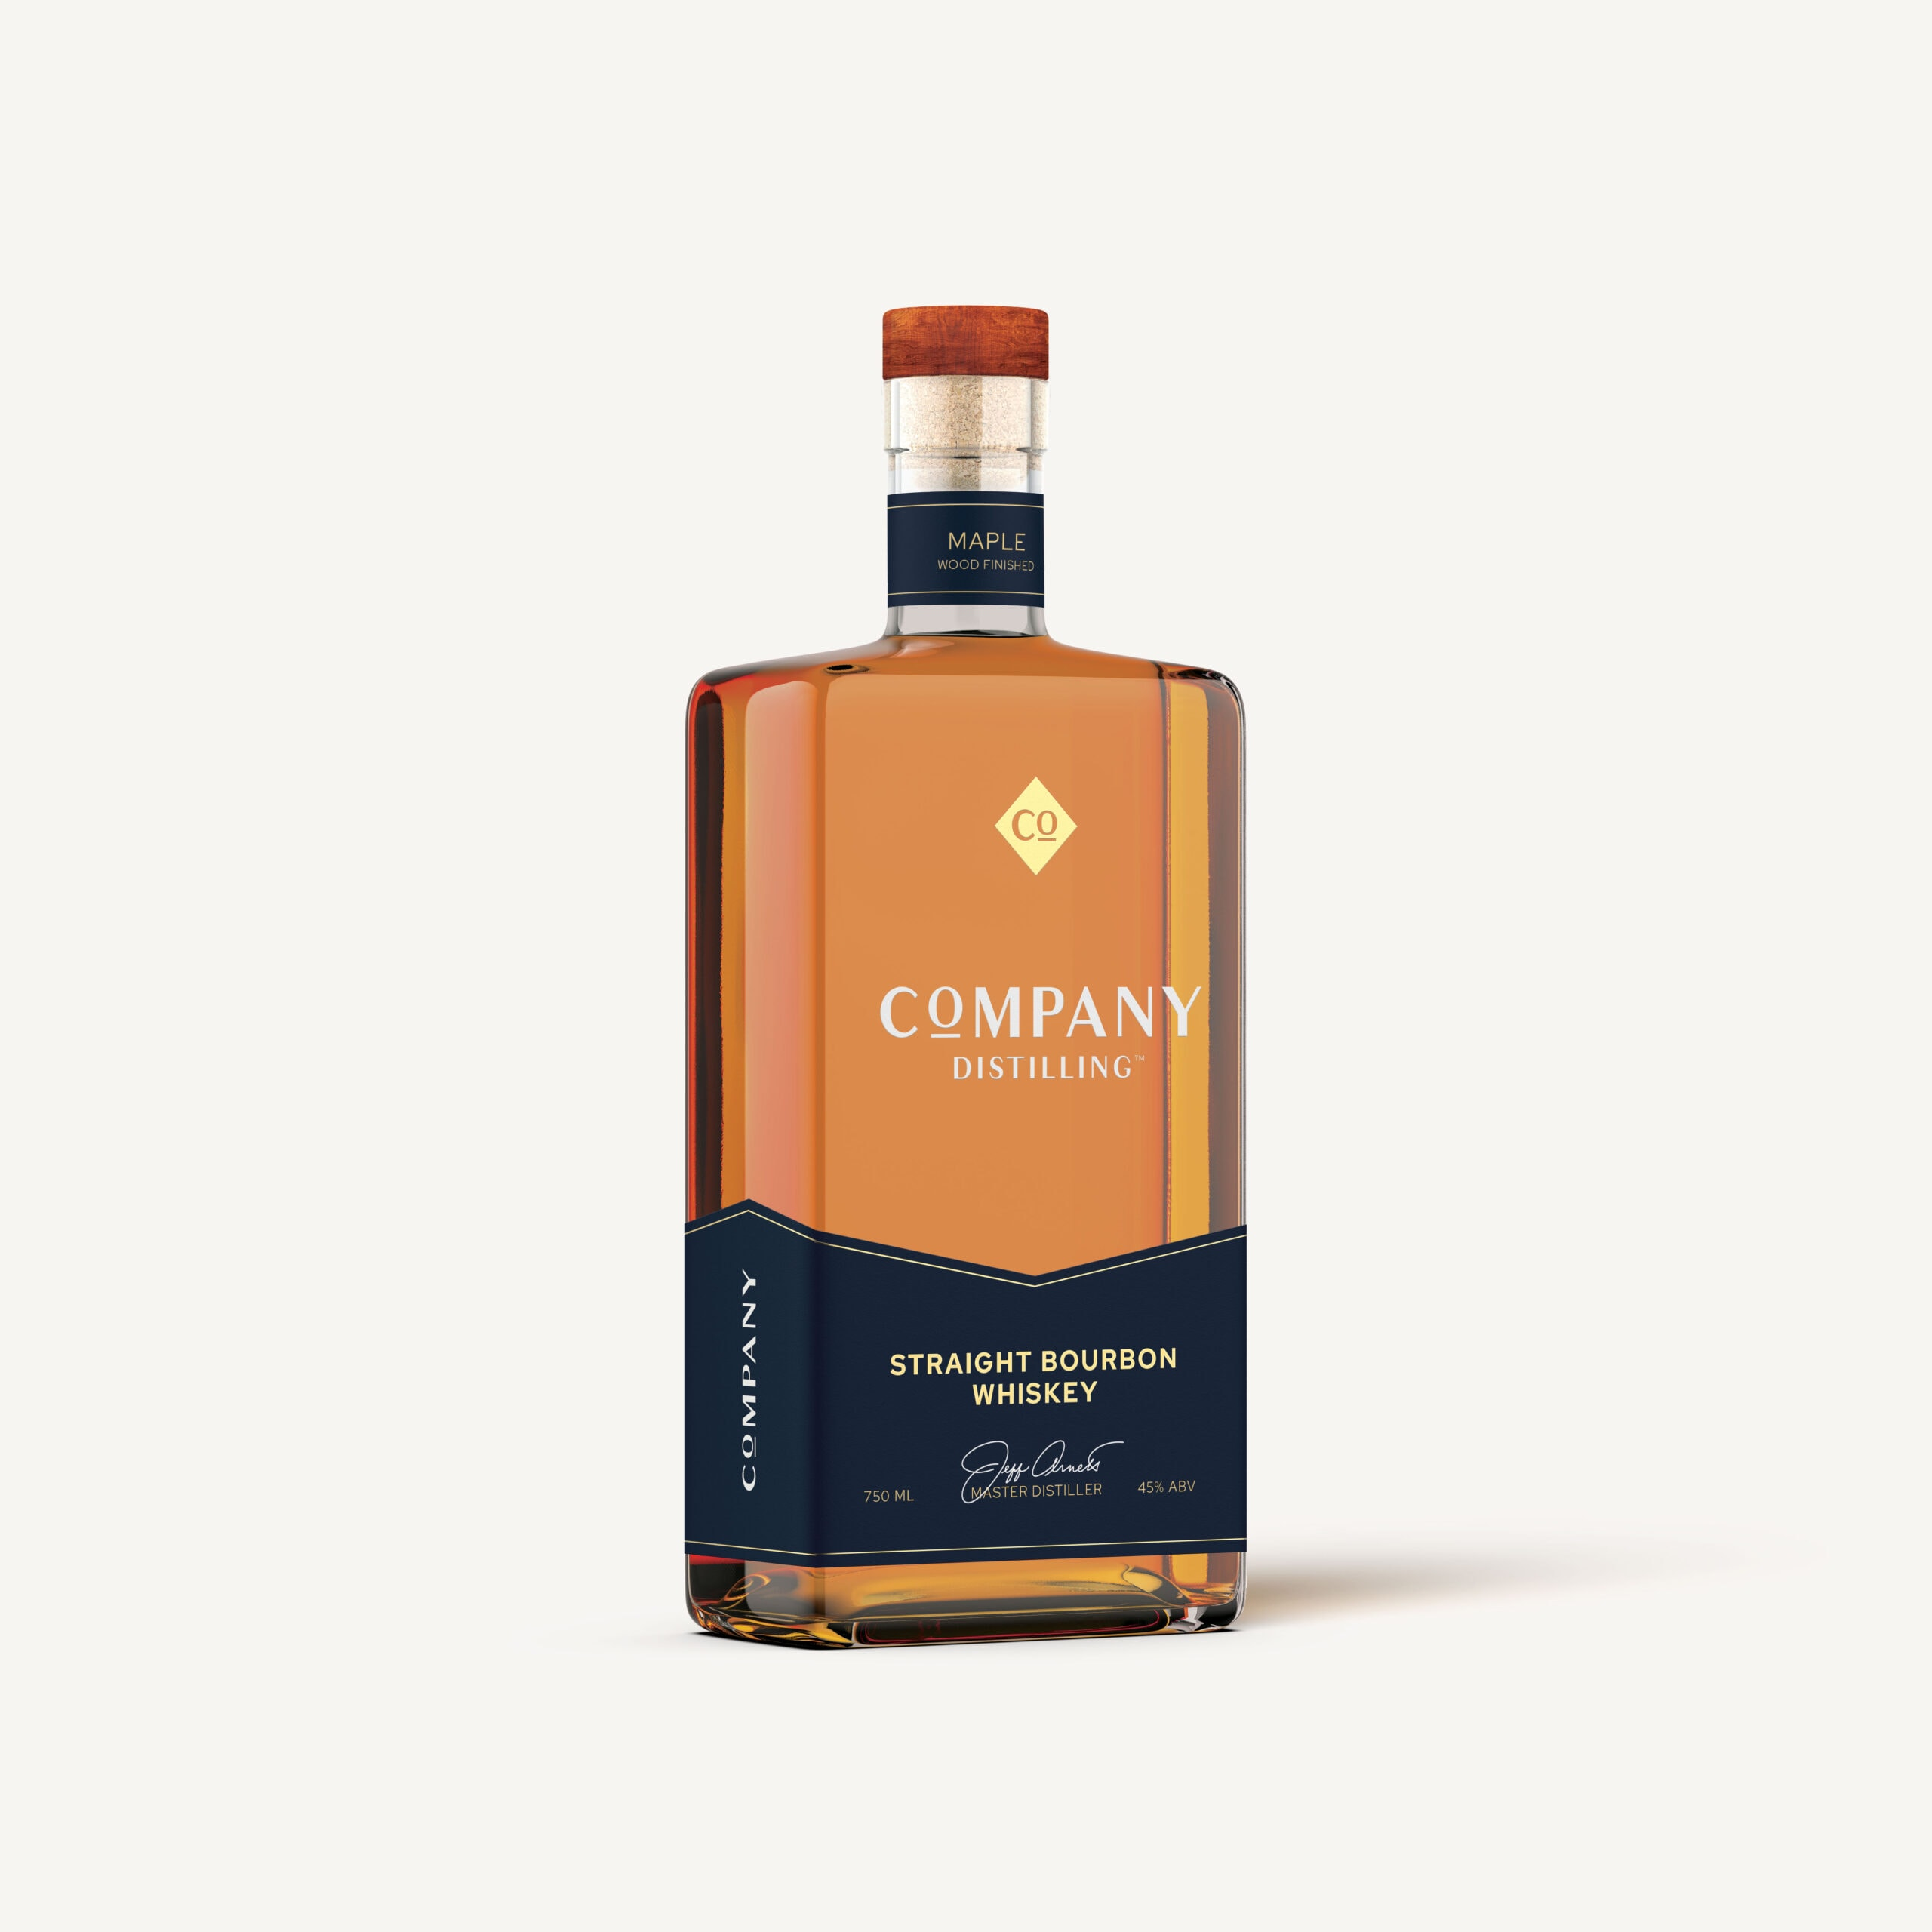 Company distilling bourbon bottle